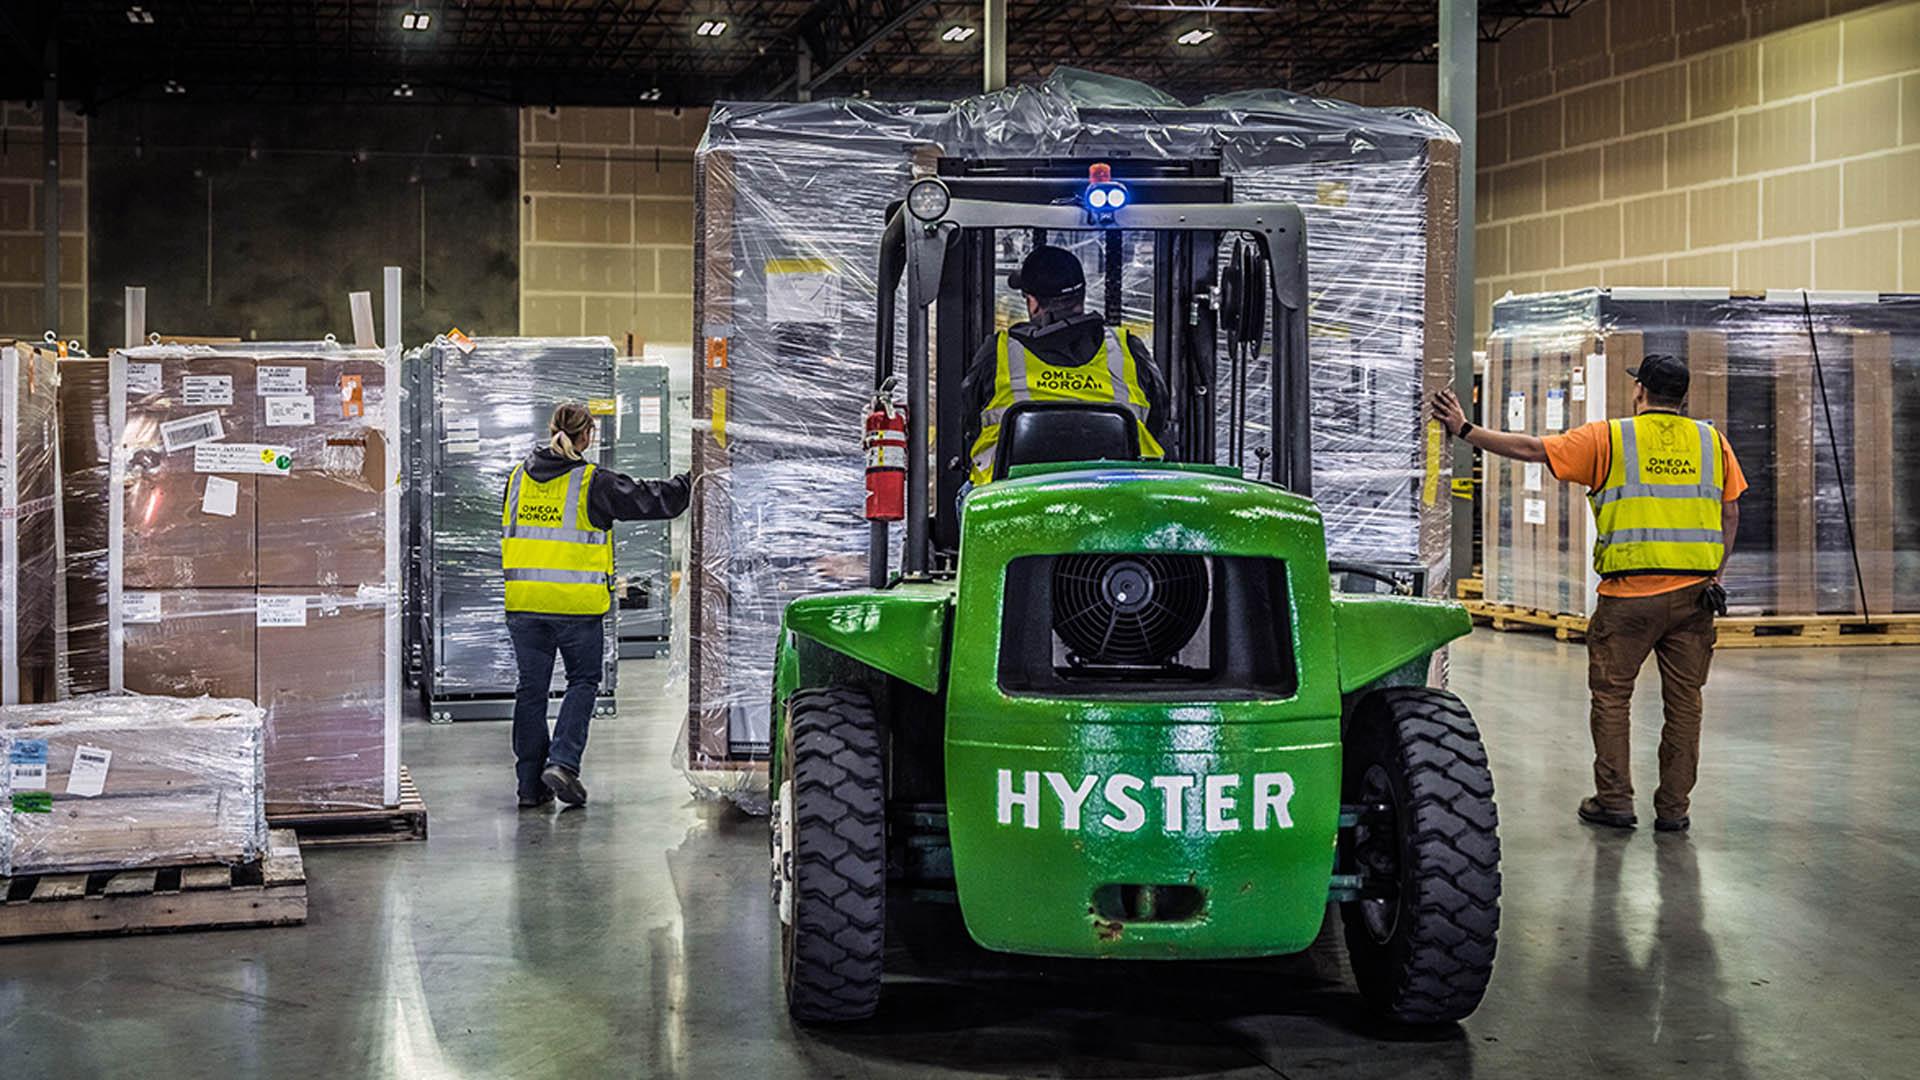 4. Transportar cargas más pesadas